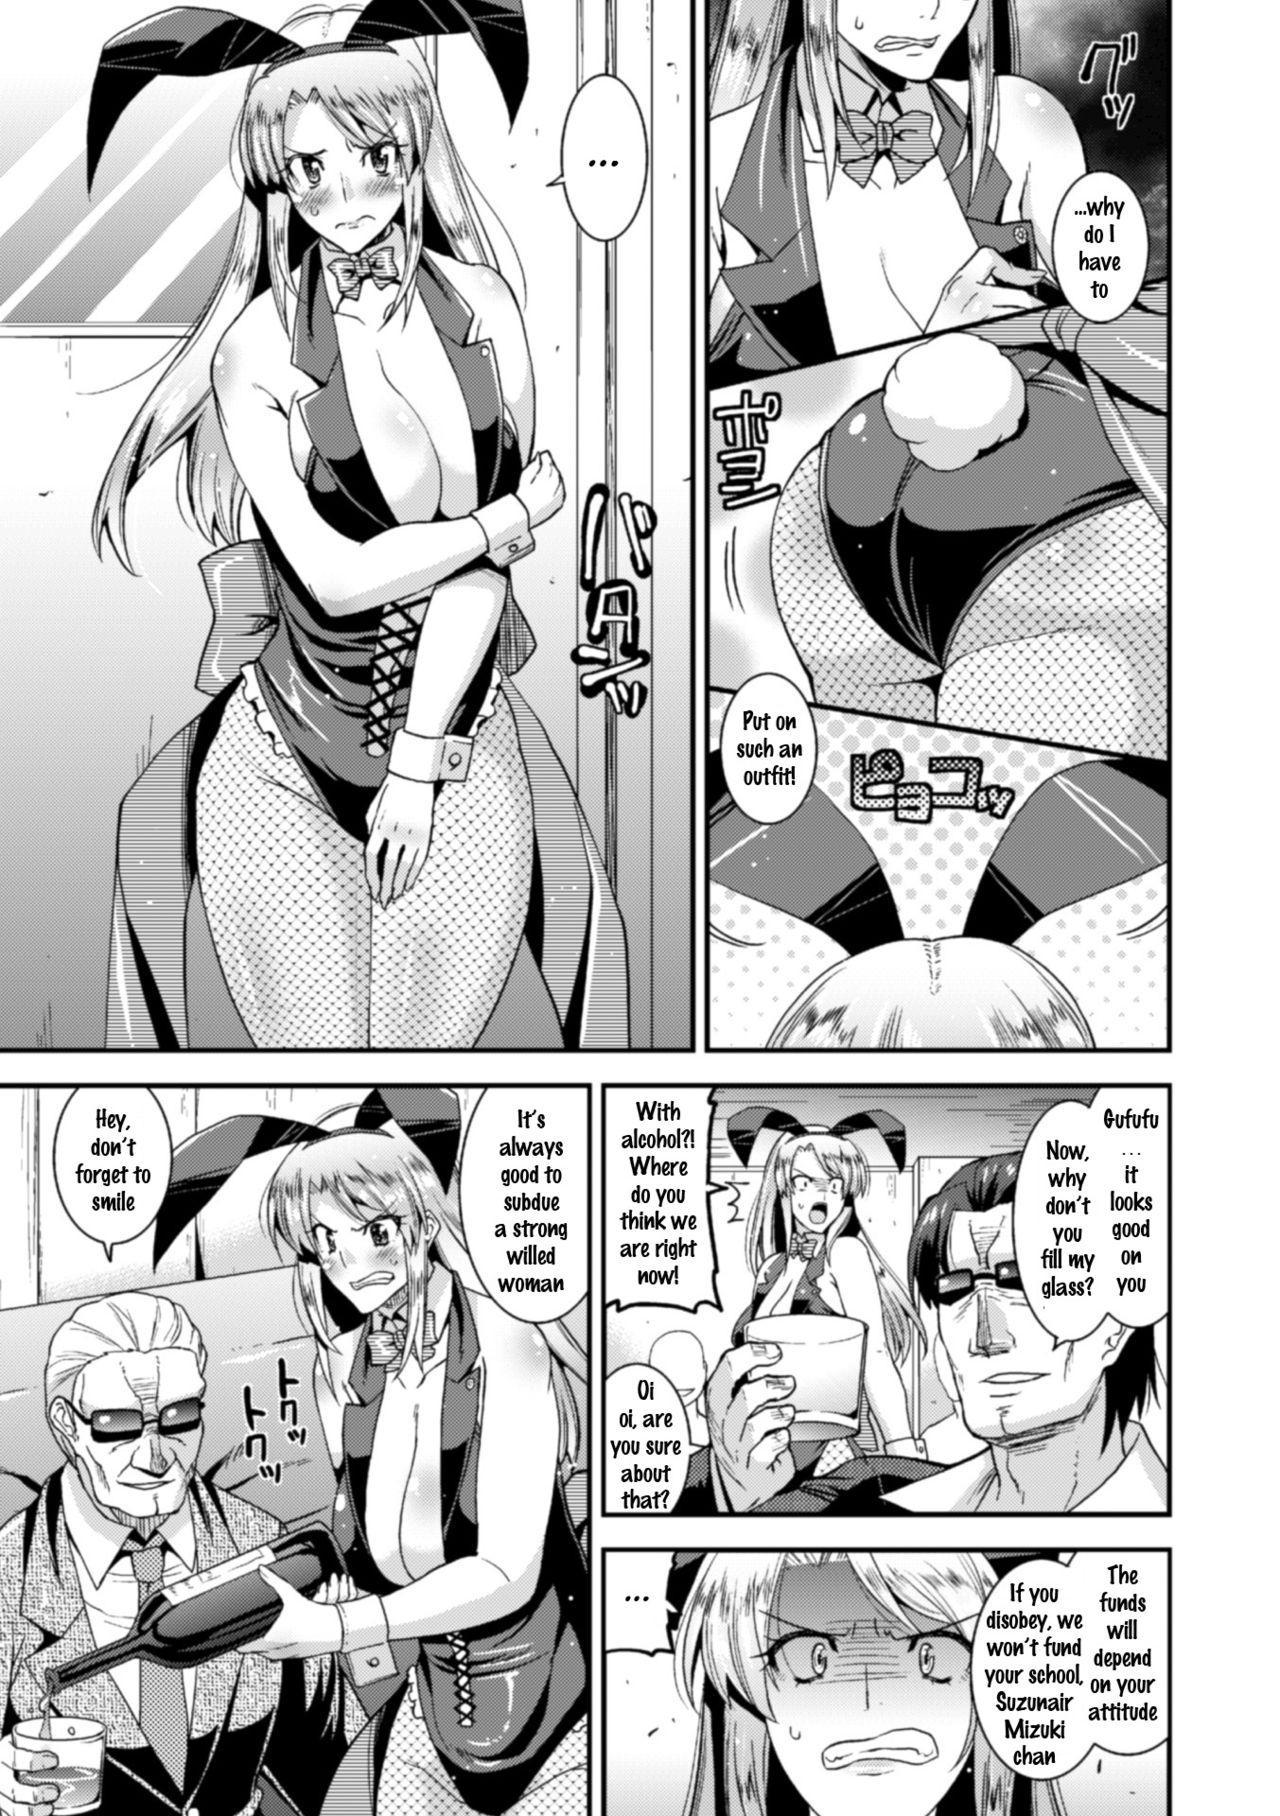 2D Comic Magazine Waki Fechi Bunny Girl Vol.1 Ch 1-3 50